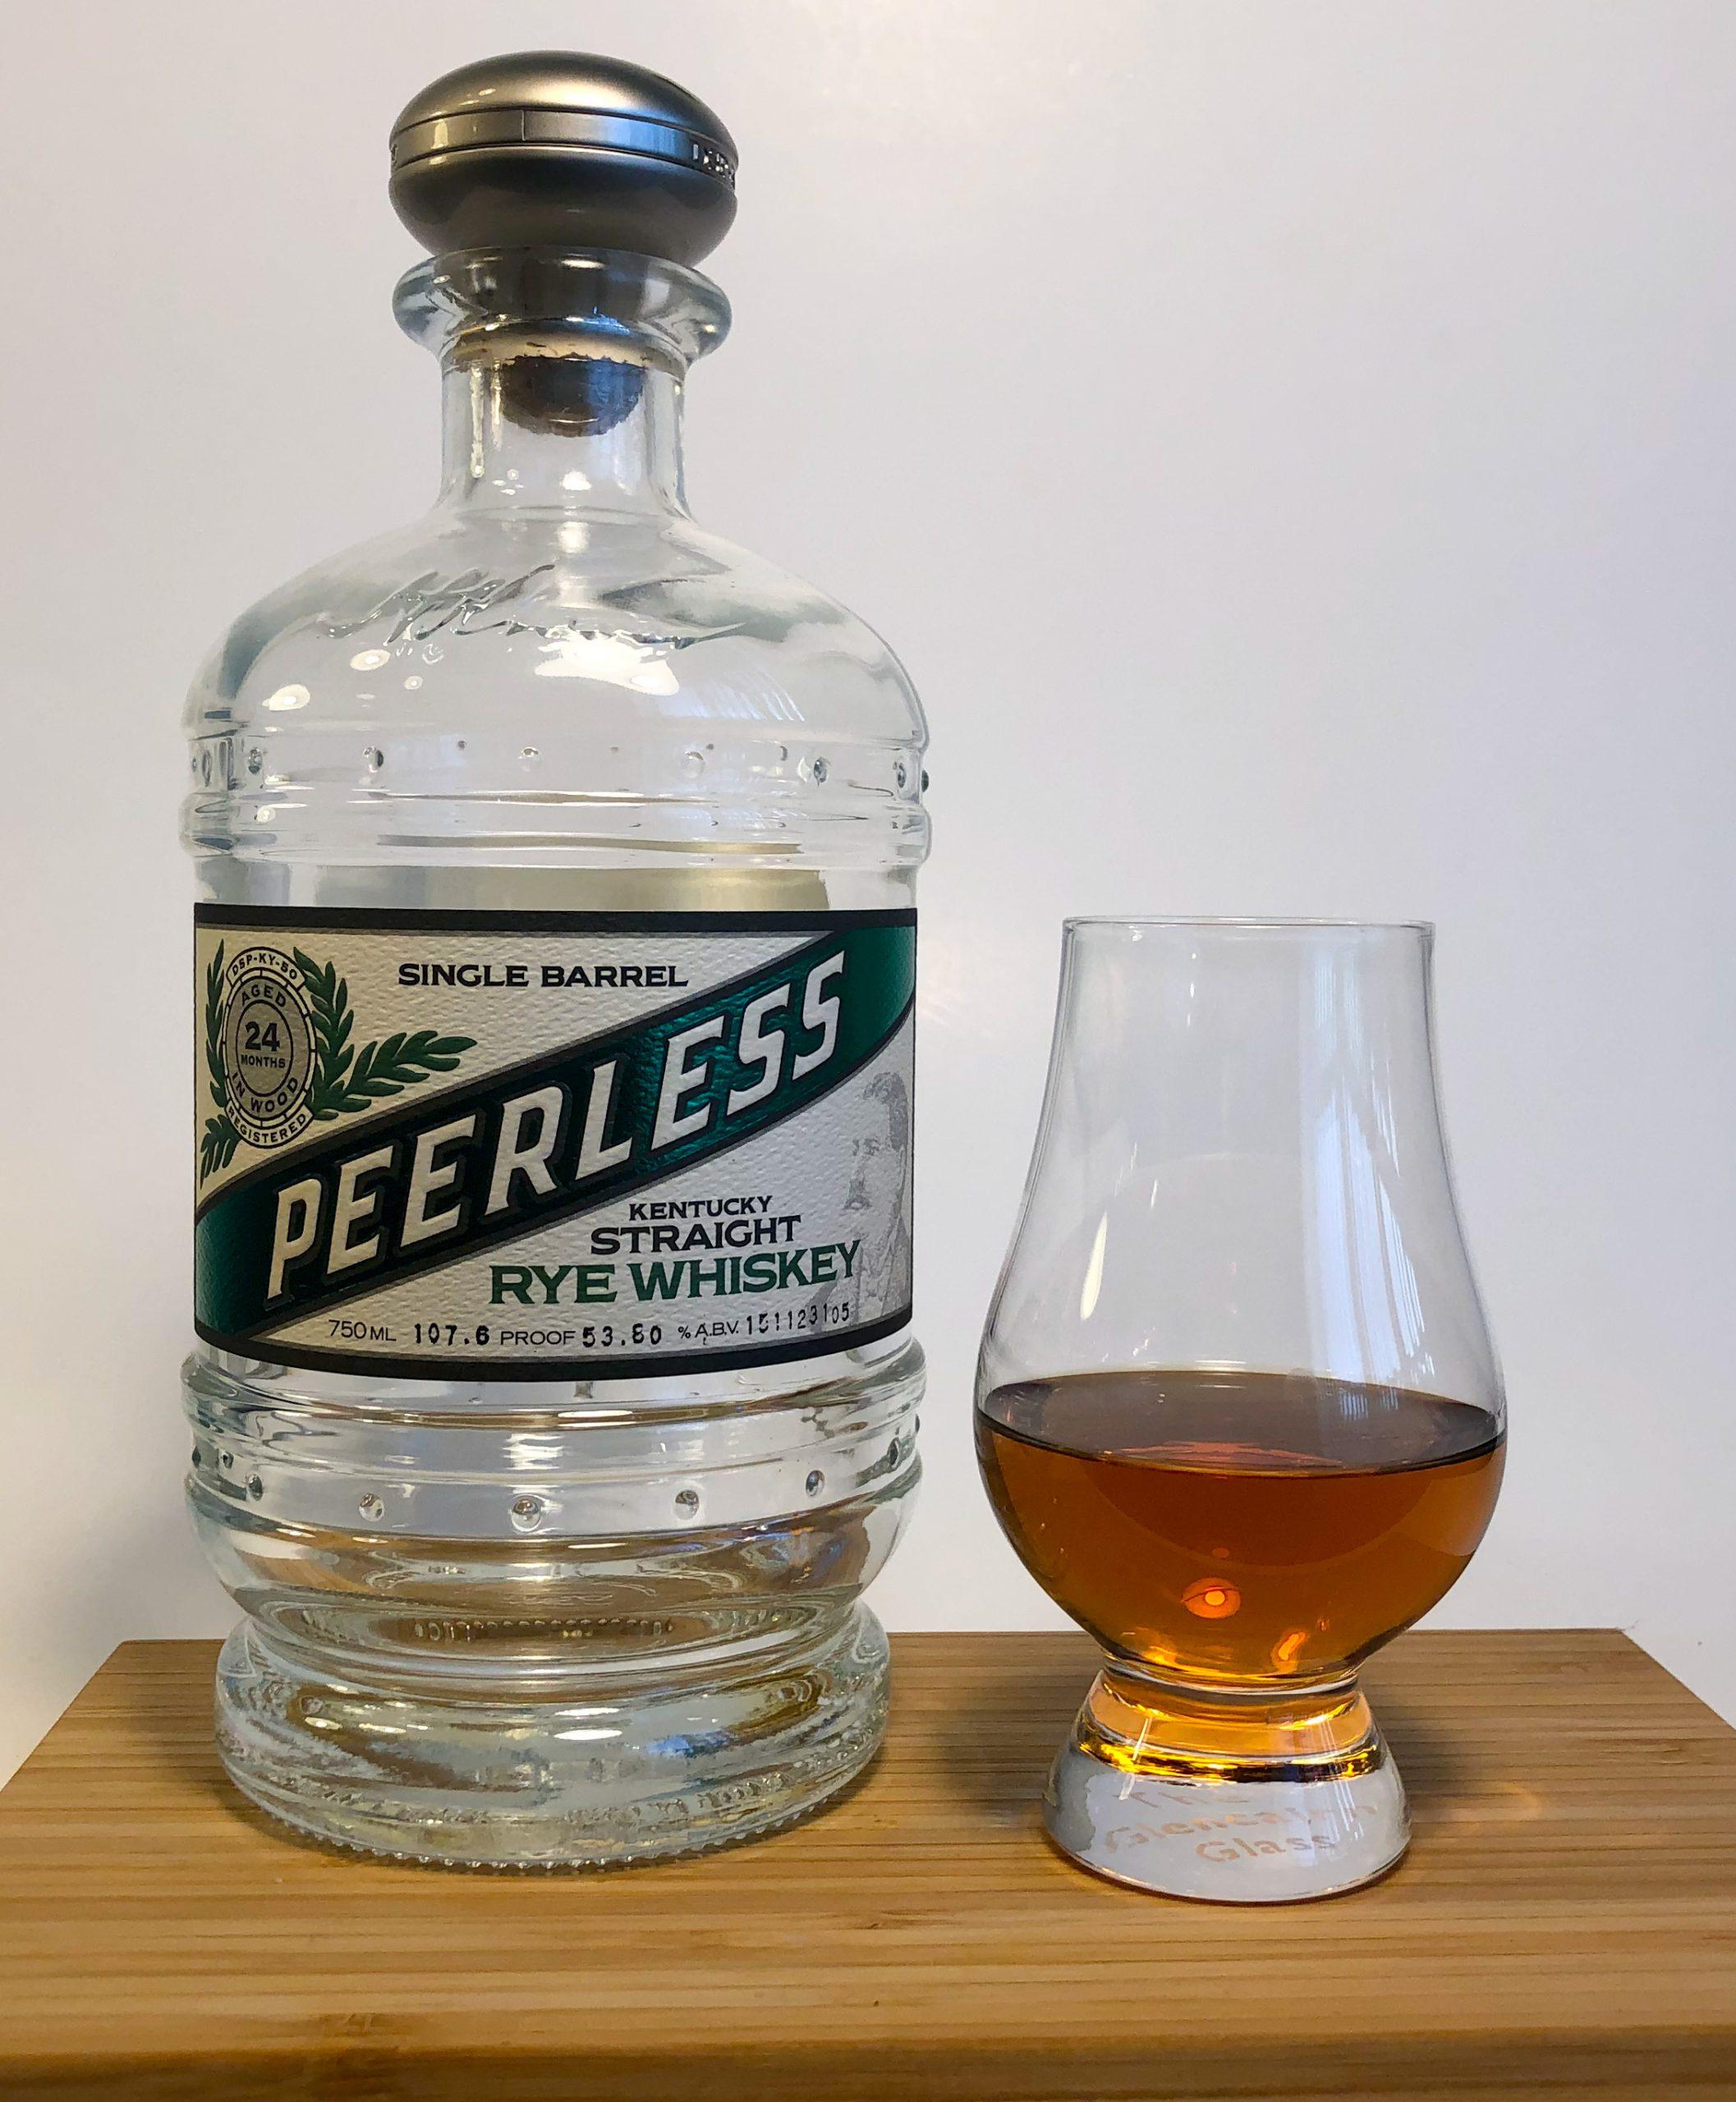 Peerless Single Barrel Kentucky Straight Rye Whiskey Westport Whiskey and Wine & C+S Collaboration #1 Selection